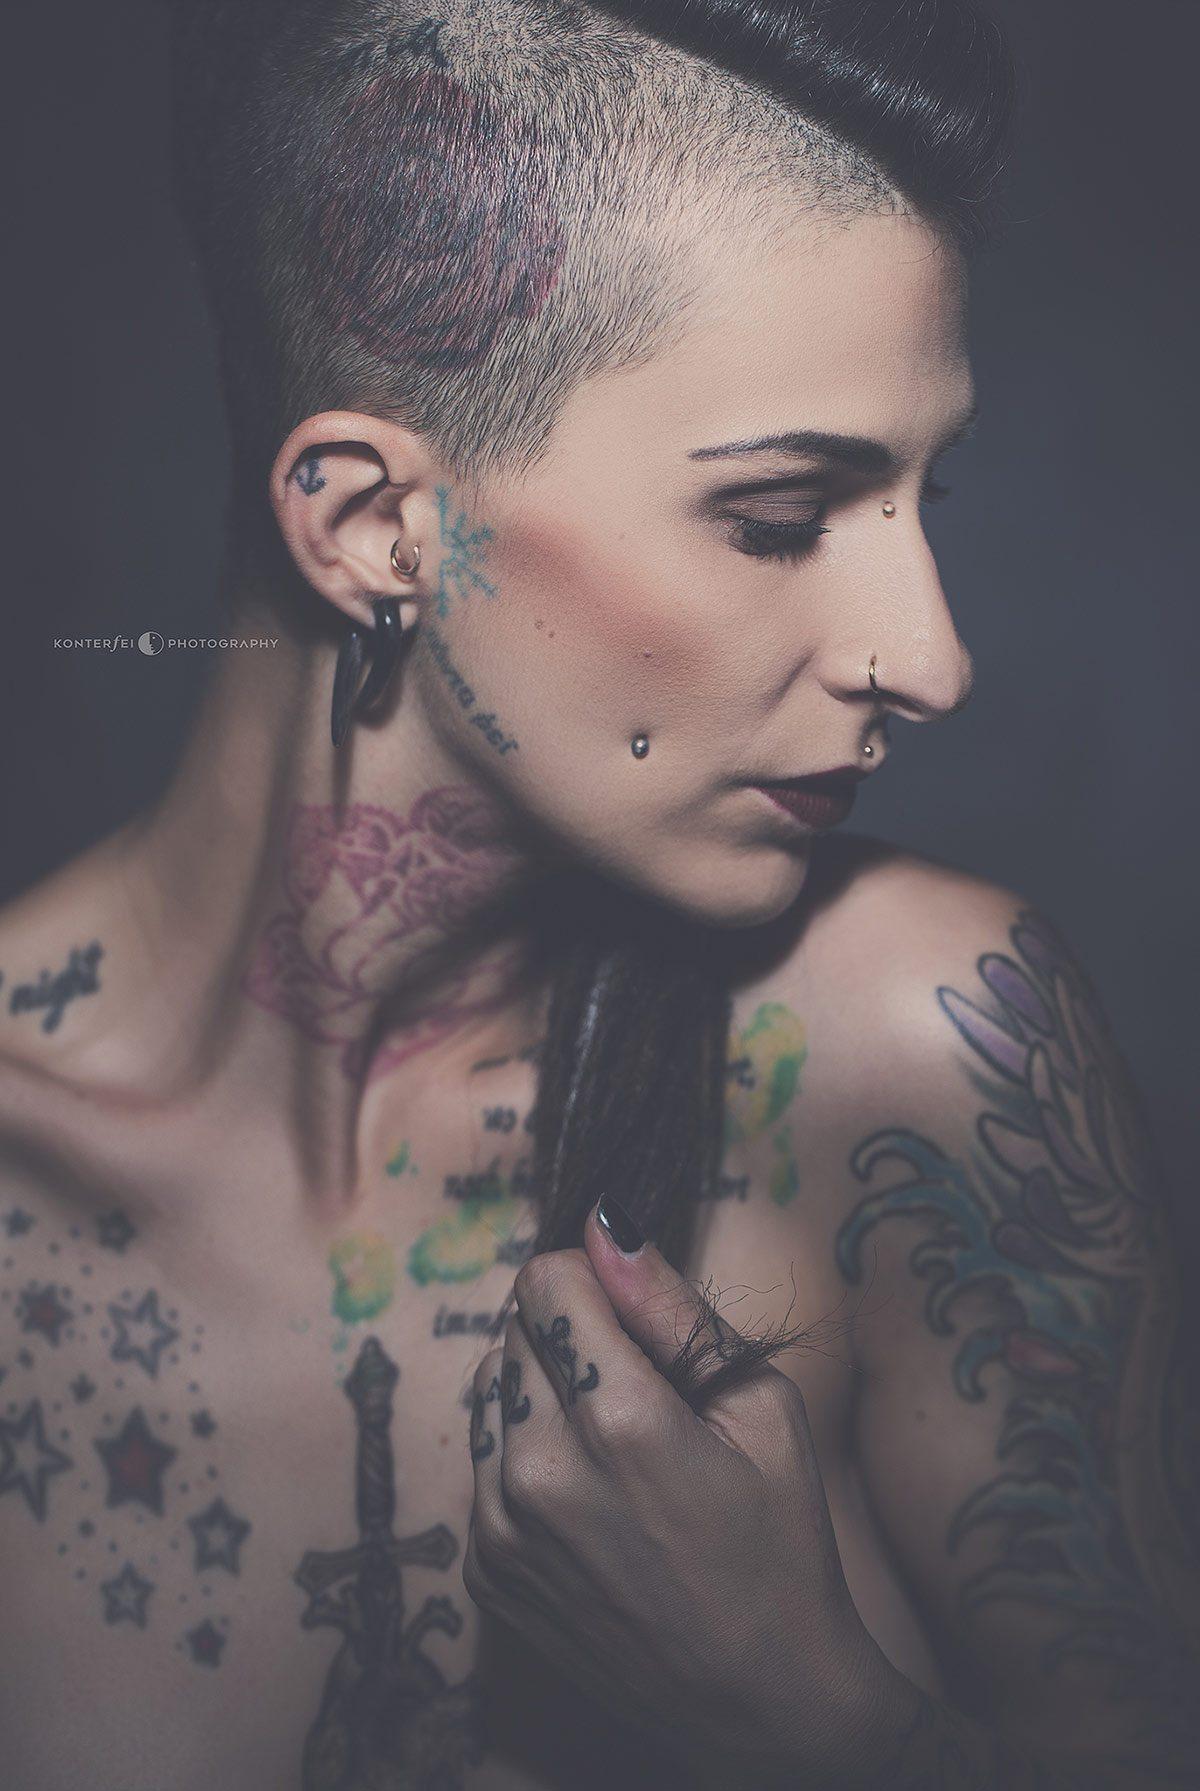 Inked Beauty | Beauty Portraits | Photography